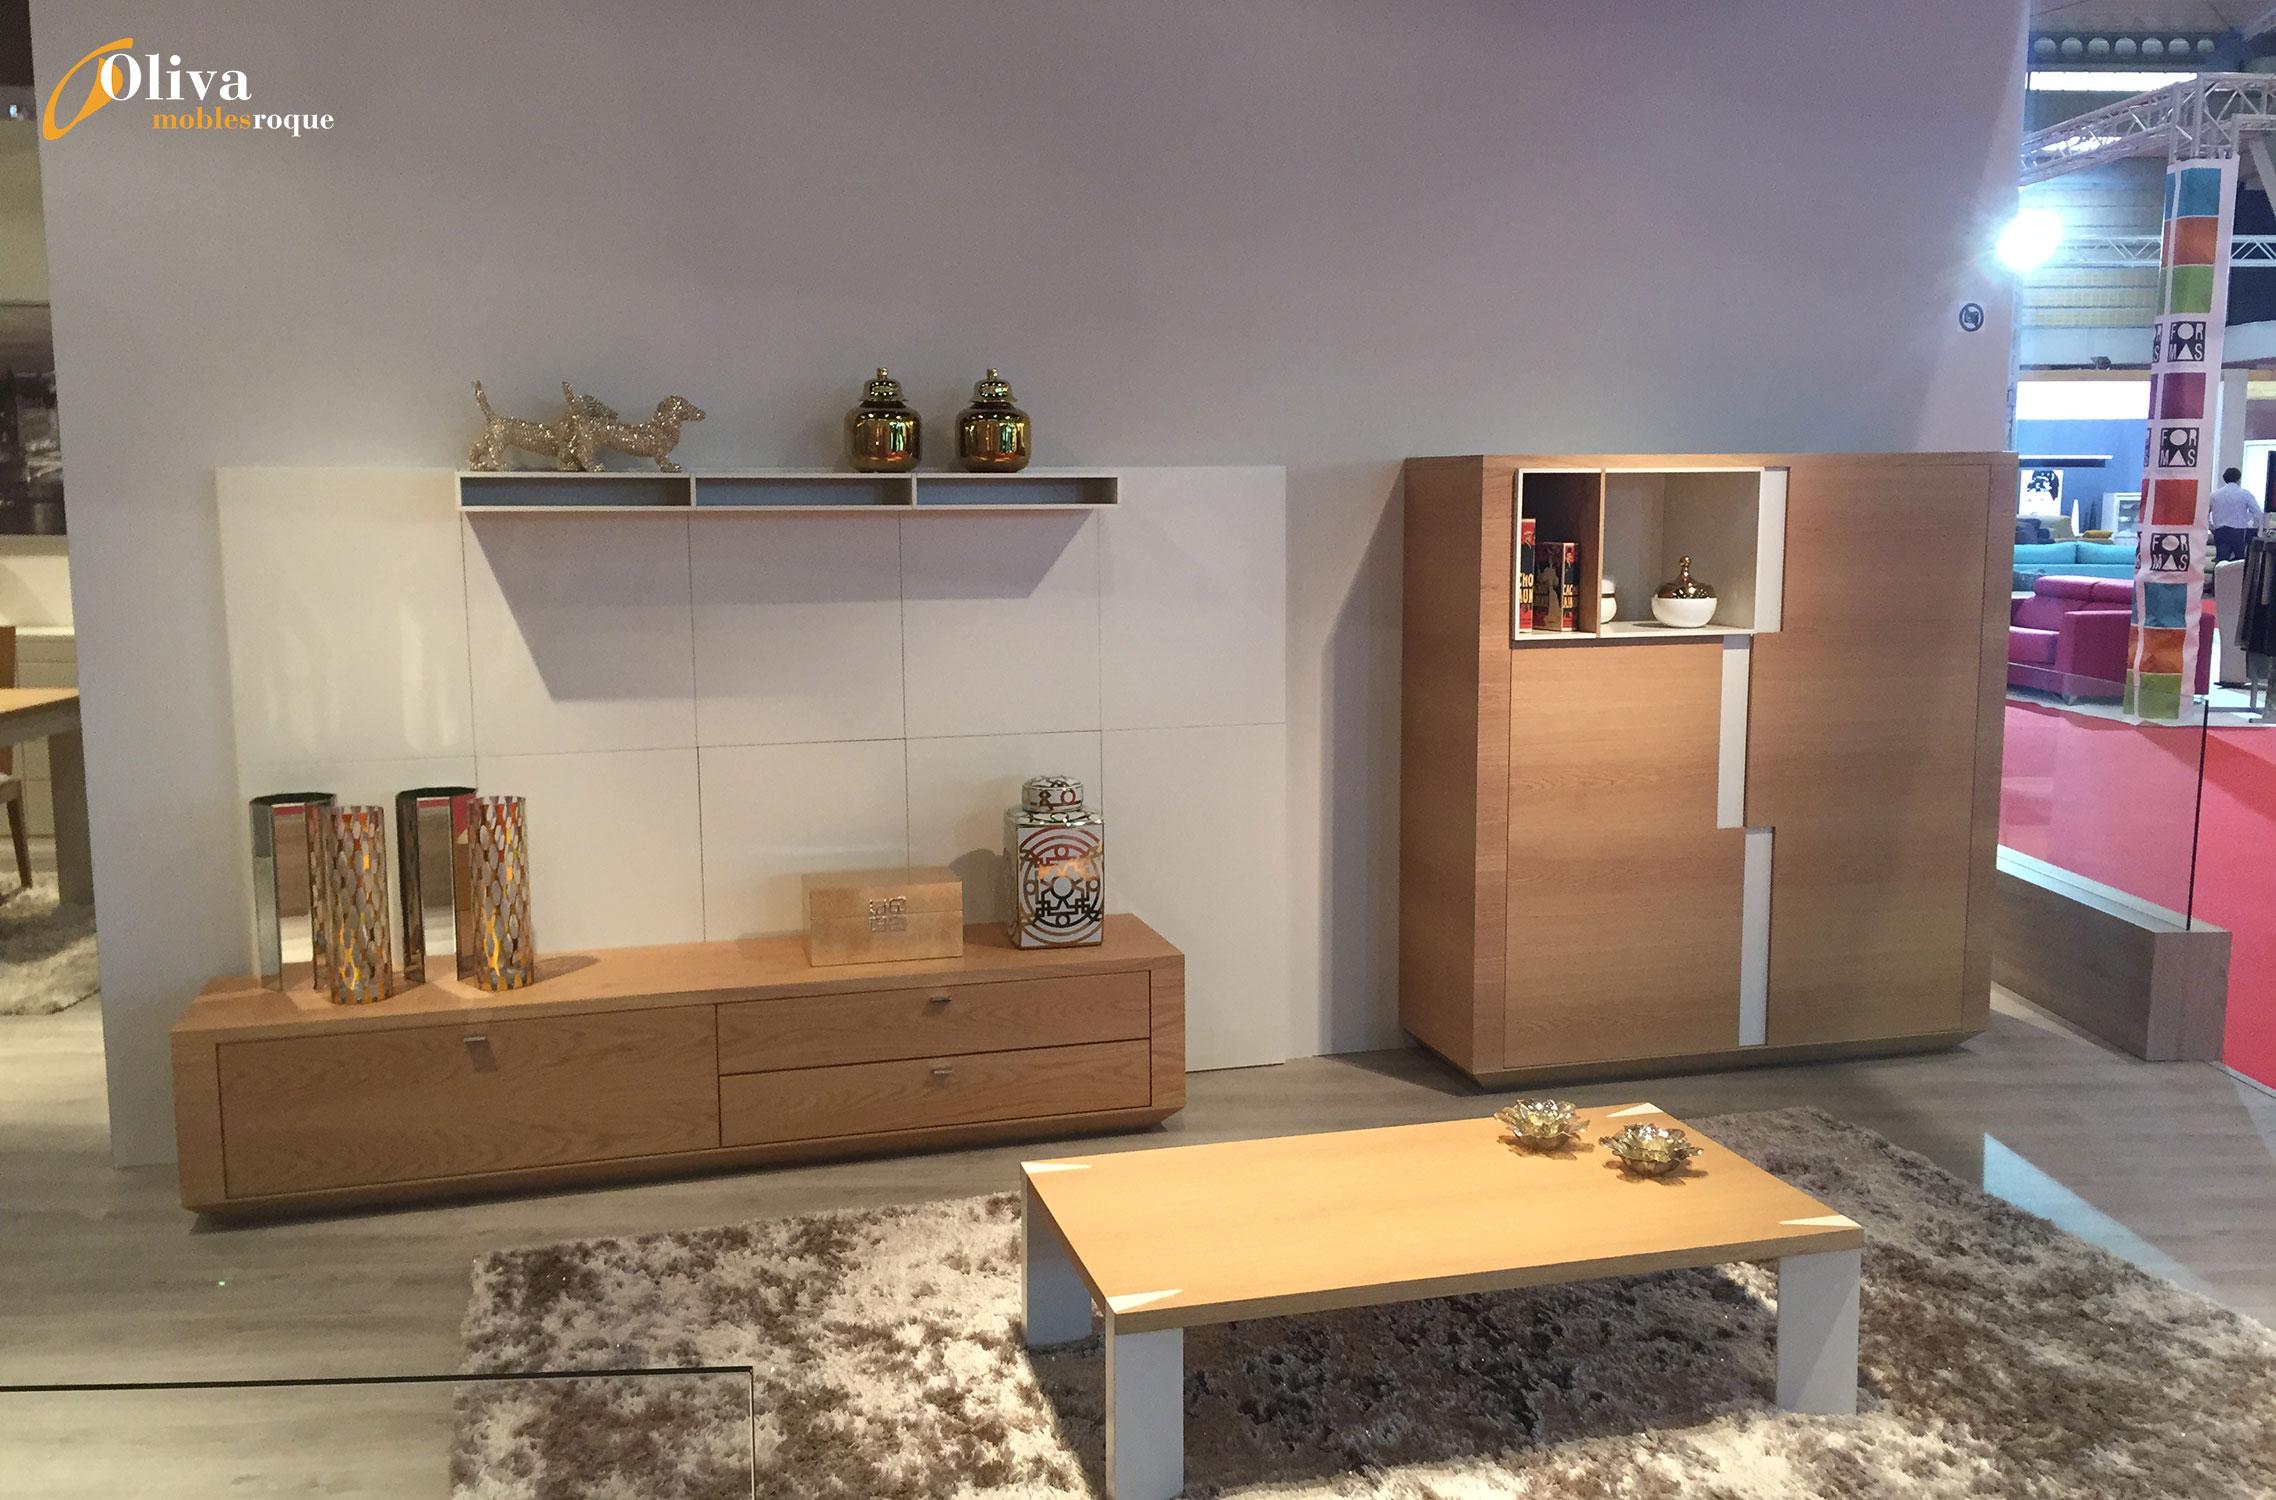 Showroom del mueble barcelona 2015 for Feria del mueble de madrid